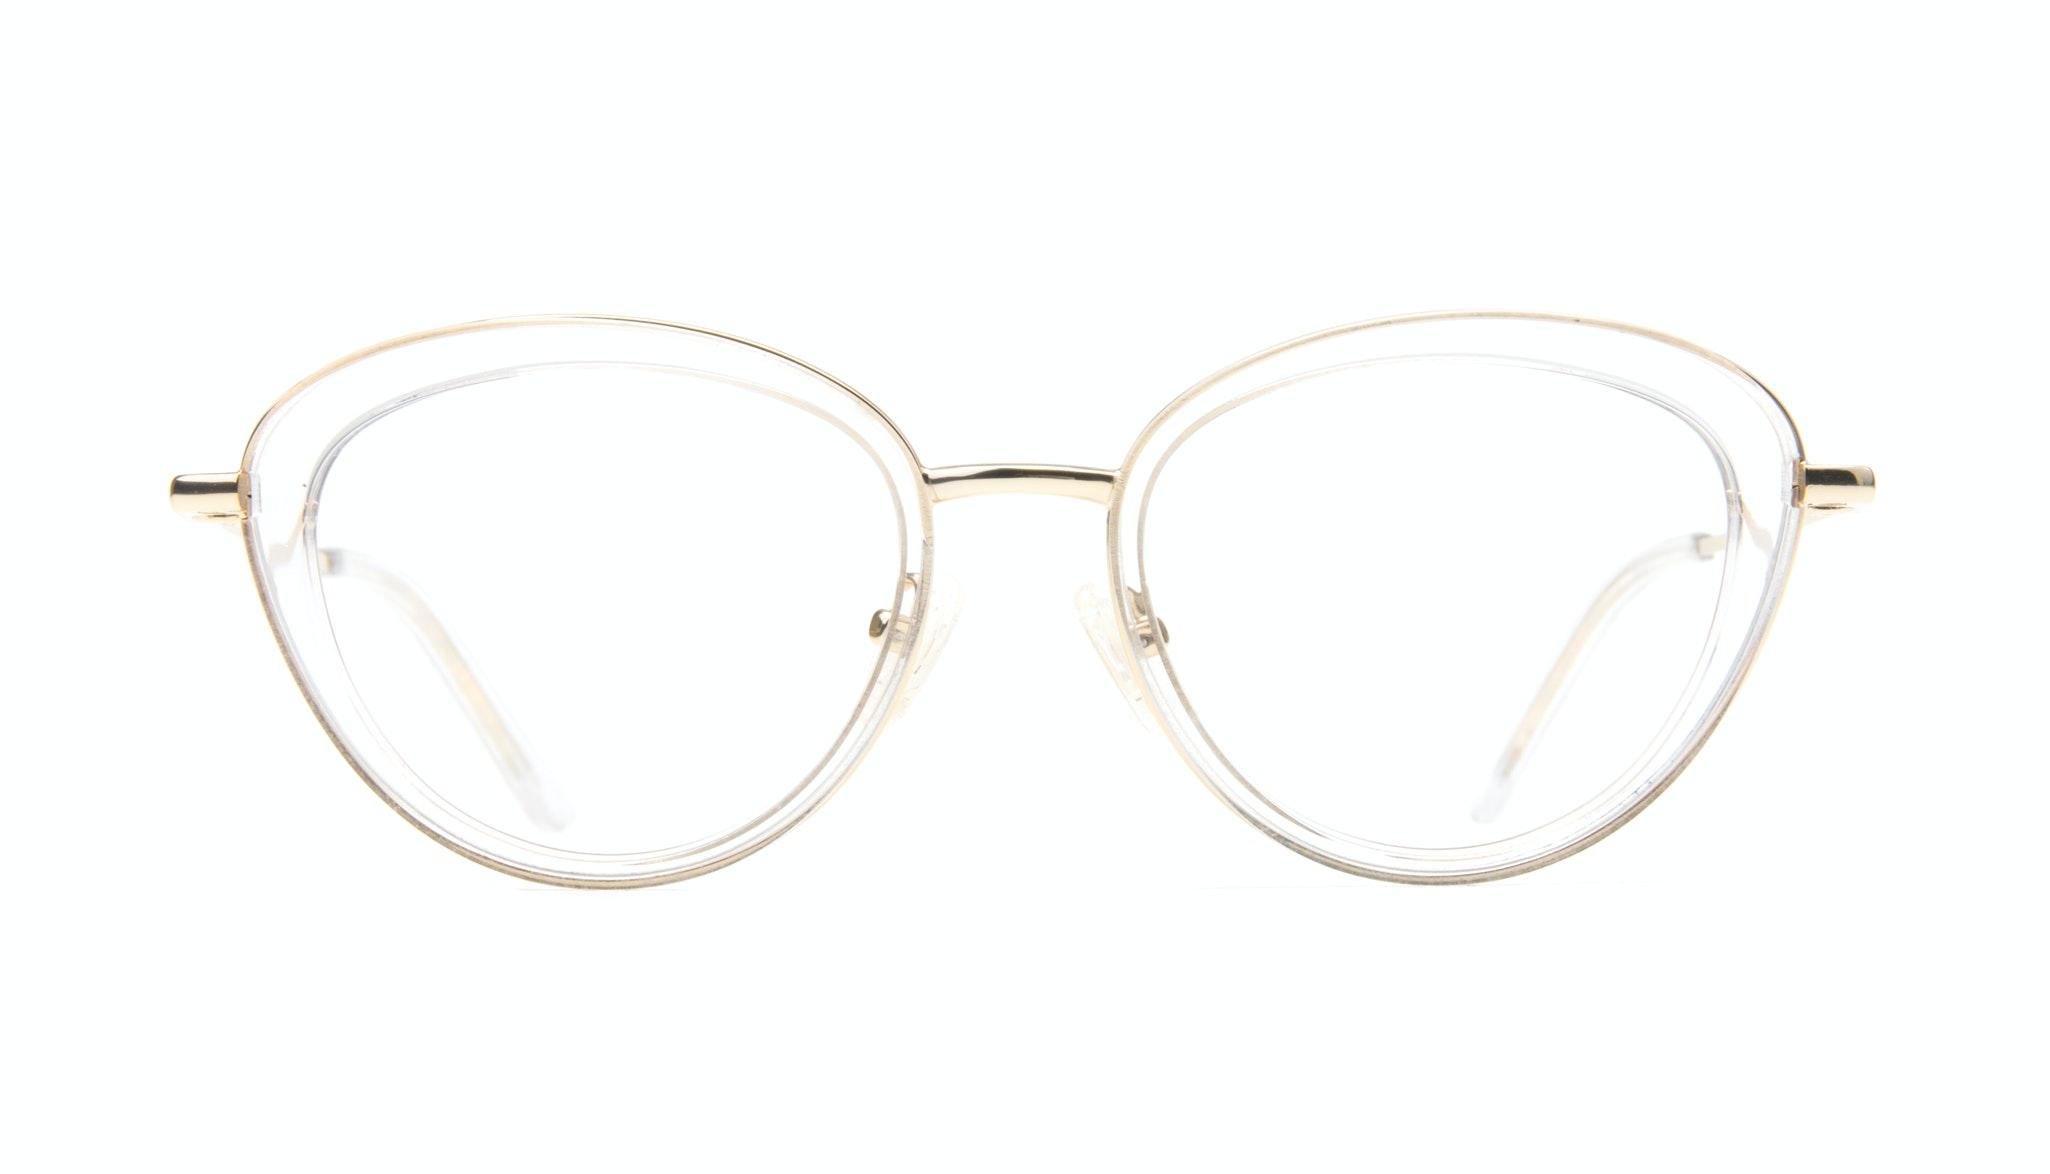 Affordable Fashion Glasses Cat Eye Eyeglasses Women Glory Gold Diamond